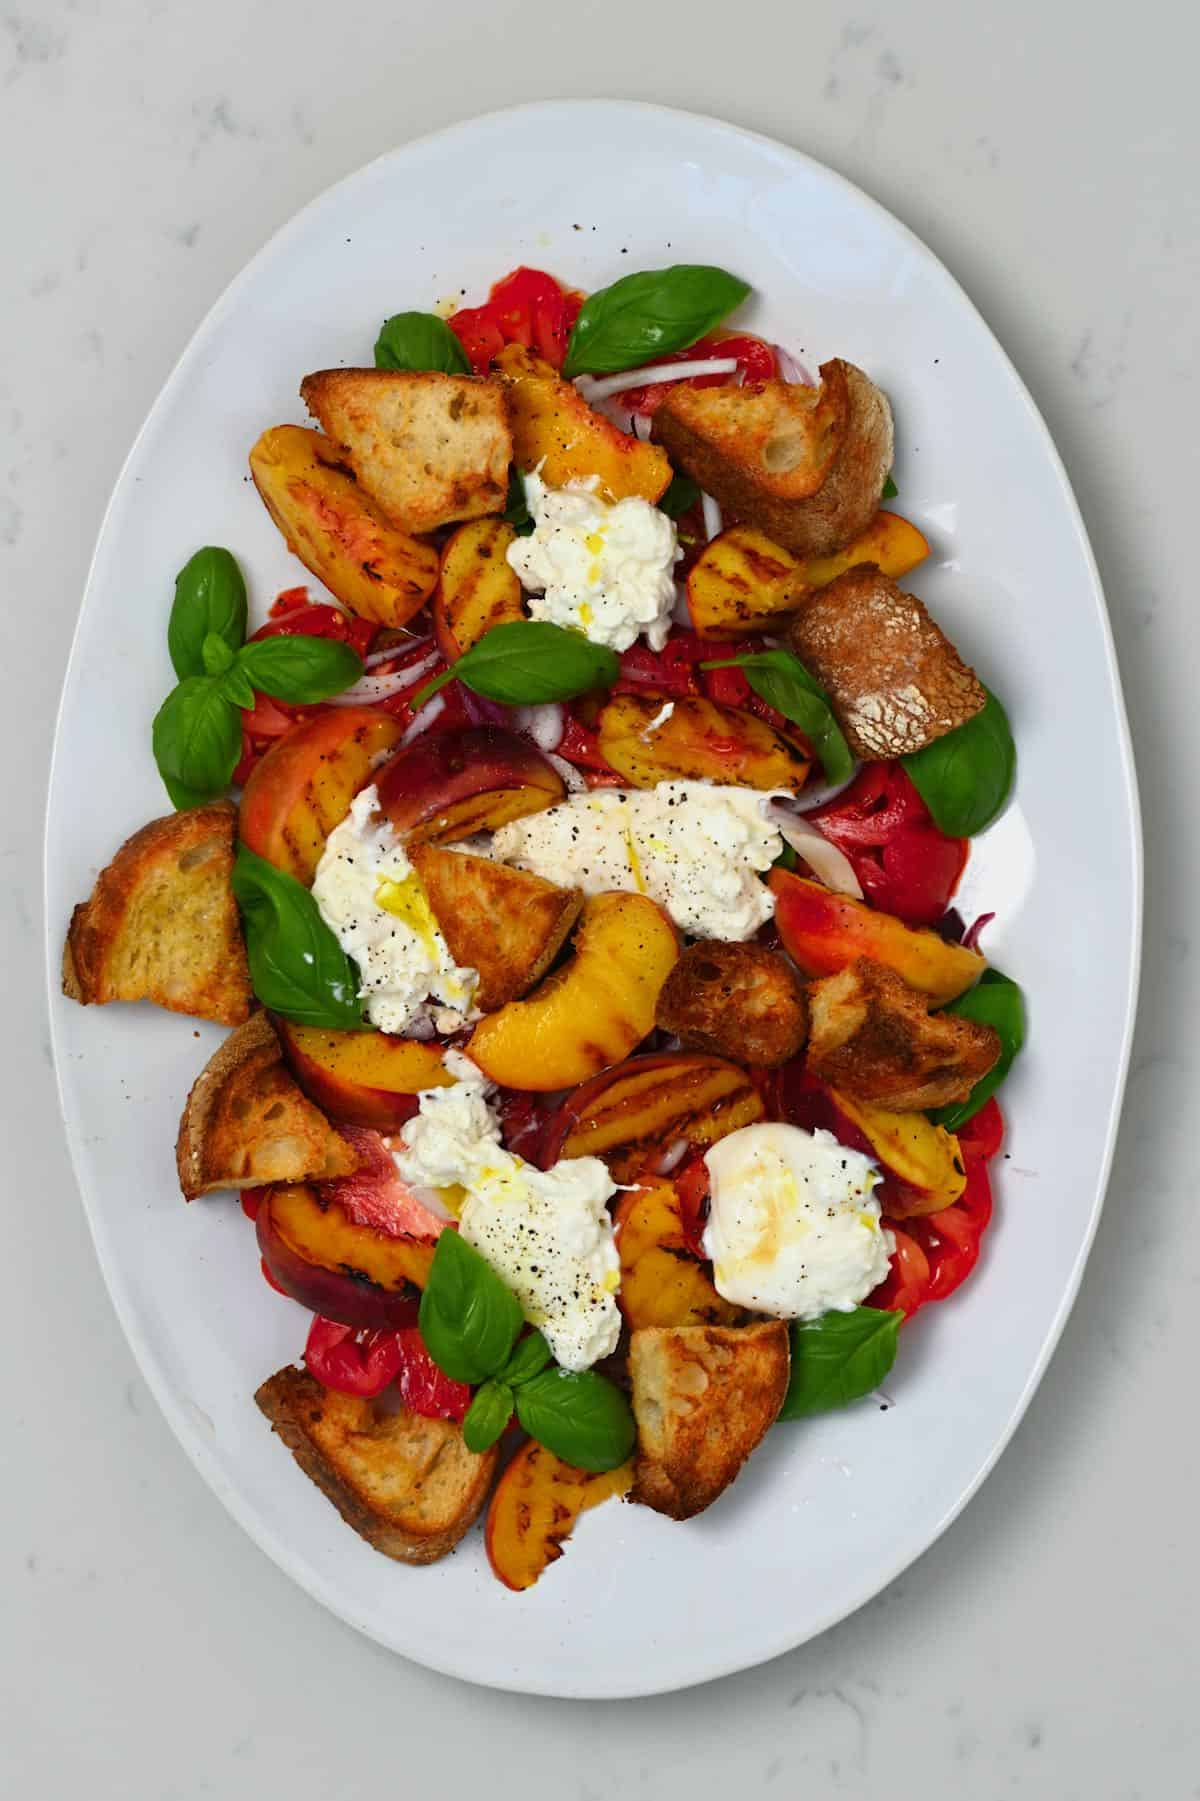 Peach tomato salad on a plate